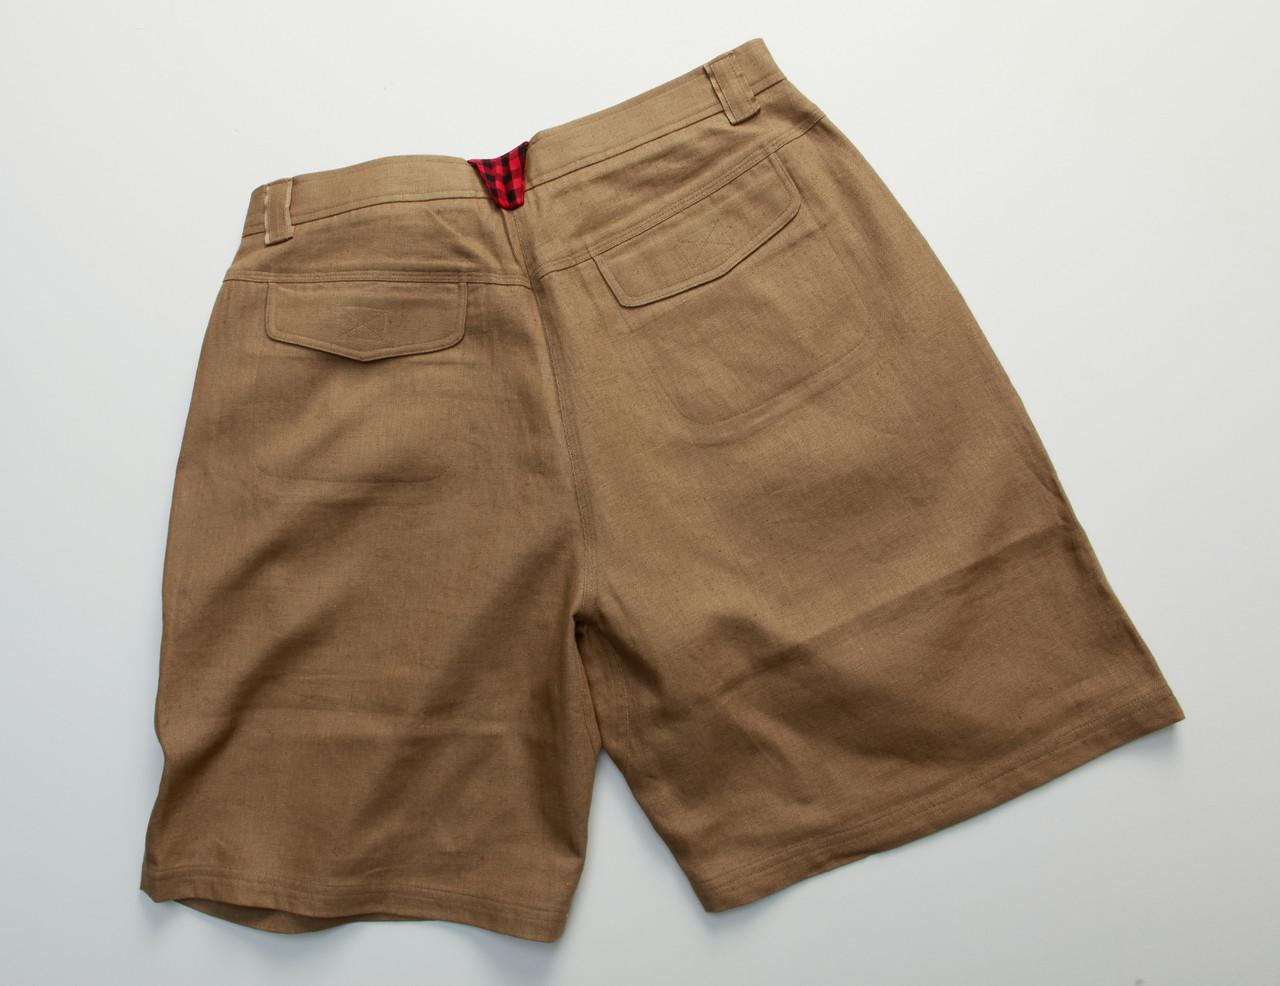 Halyard Shorts - Husk/Khaki